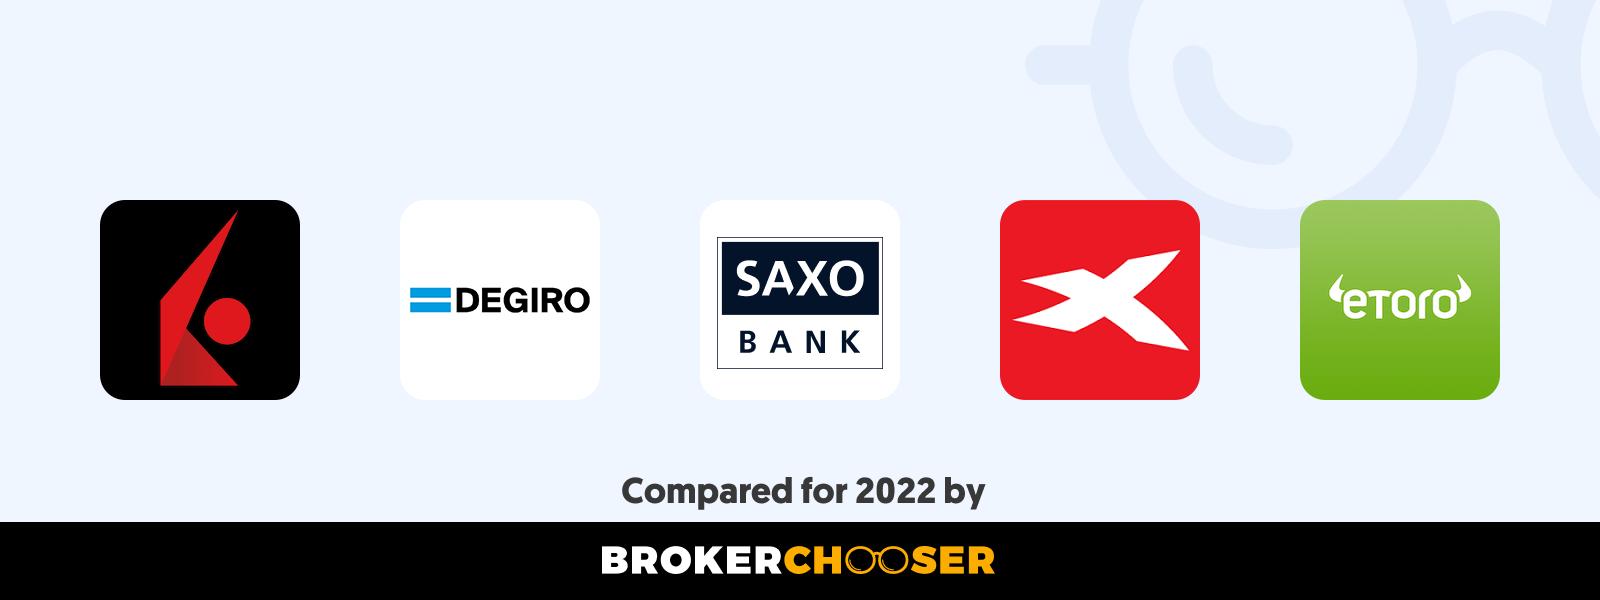 Best international online brokers for citizens in the Czech Republic